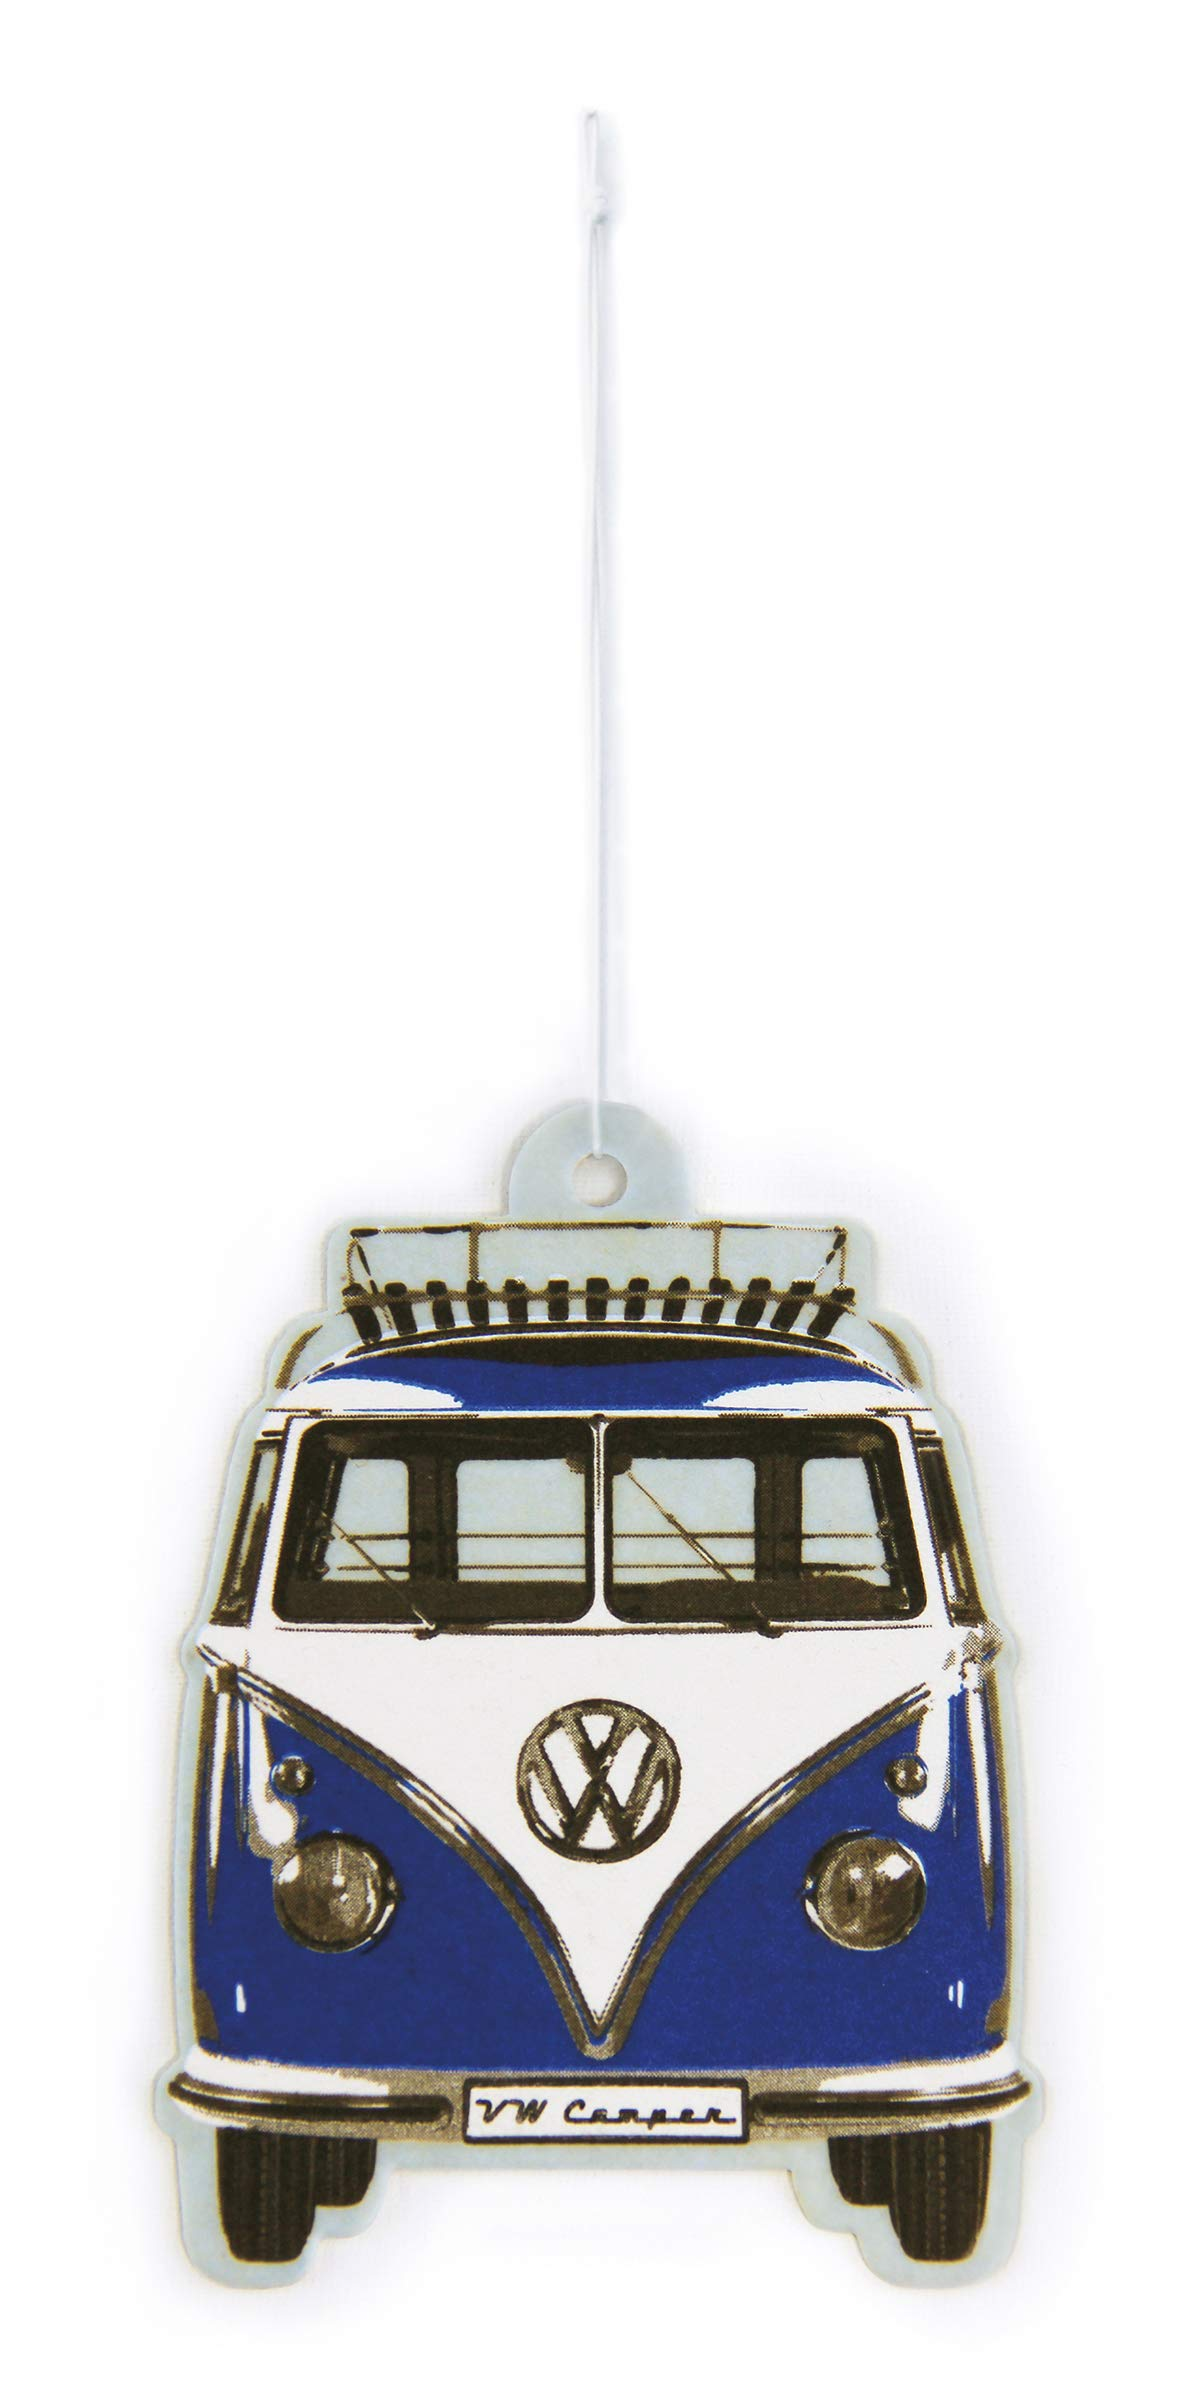 BRISA VW Collection - Volkswagen Scented Car Air Freshener Fragrance Deodorizer for Car/Auto or Home with Volkswagen Samba Bus T1 Camper Van Front Design (Ocean/Blue)